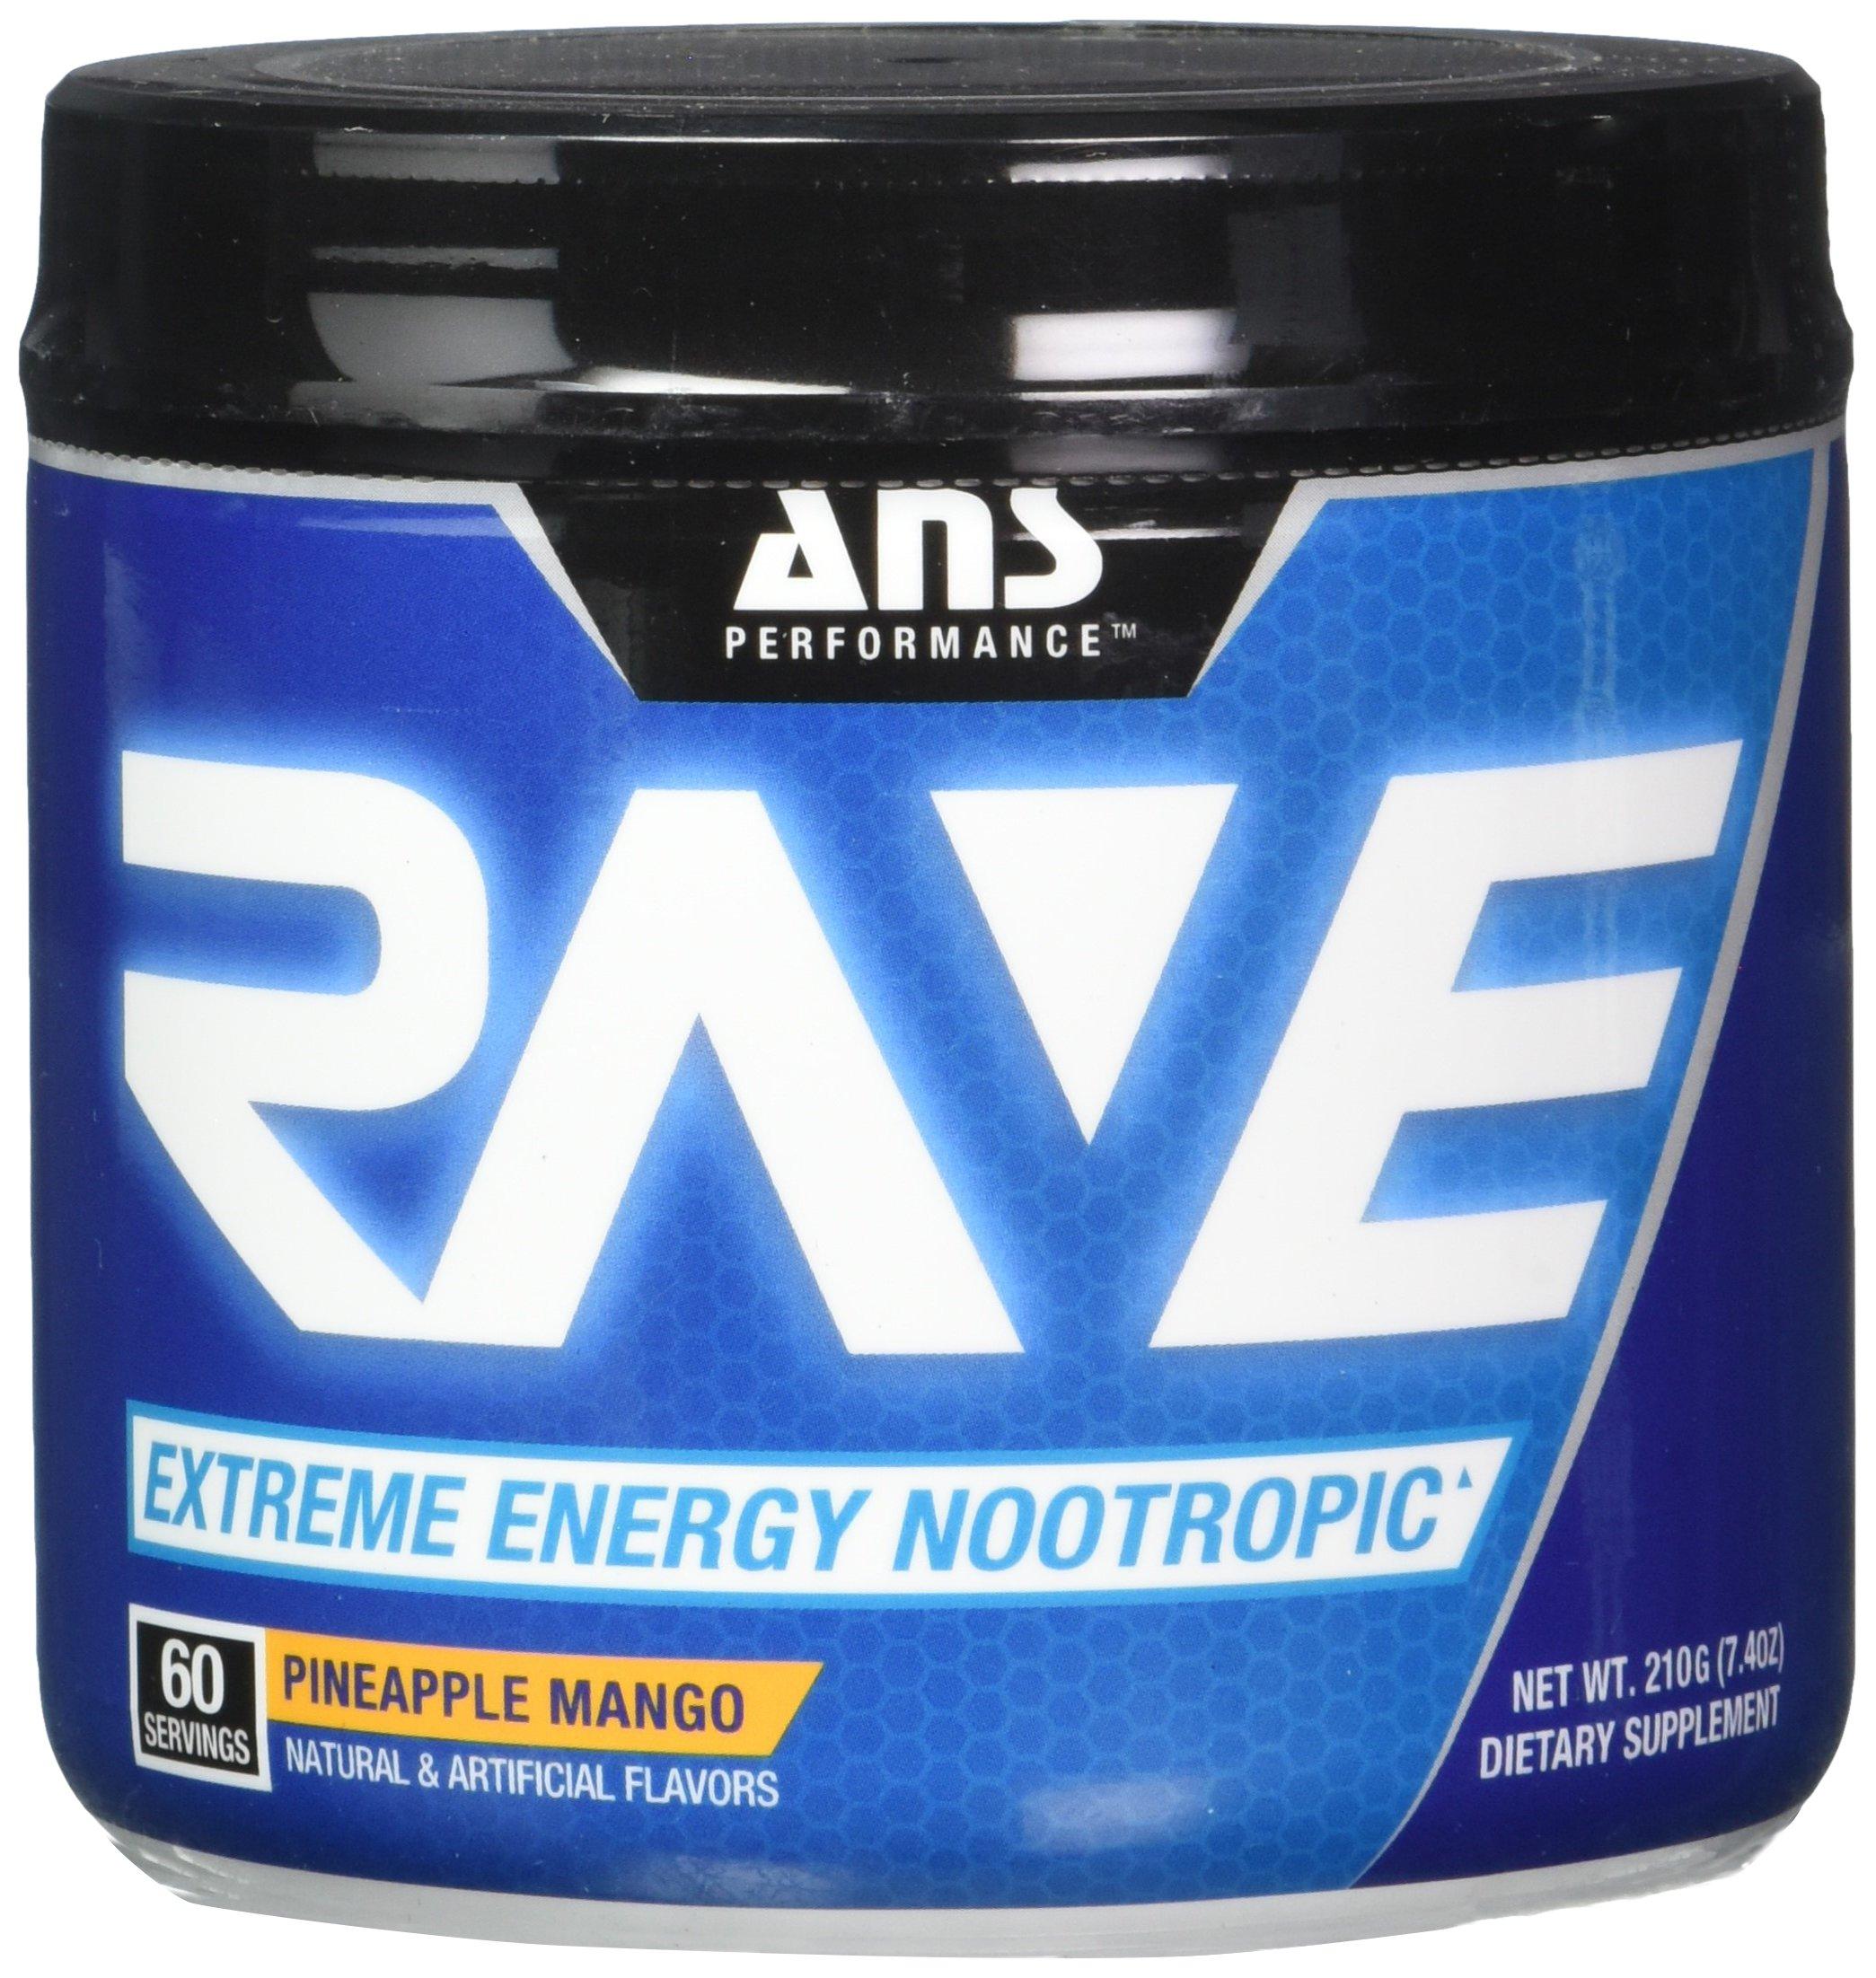 ANS Performance RAVE Extreme Energy Nootropic Pineapple Mango 60/SERV